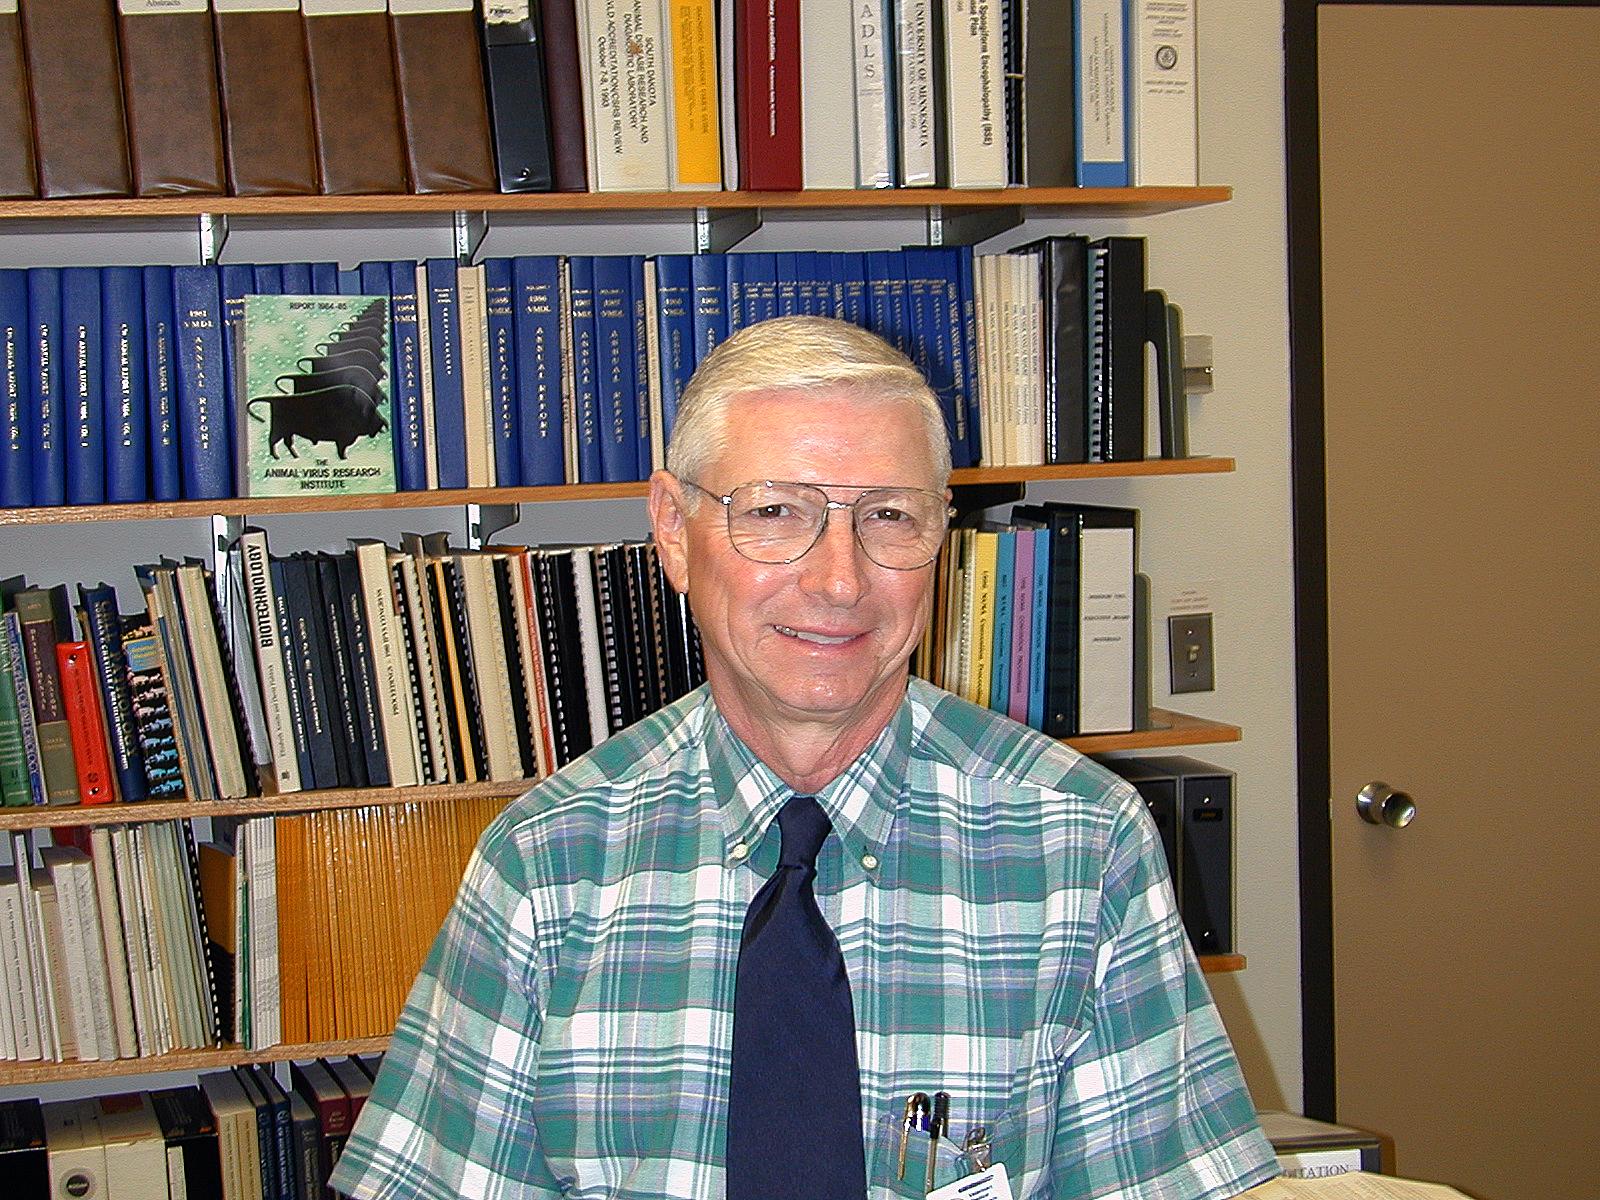 Harvey S. Gosser, DVM, MS, PhD